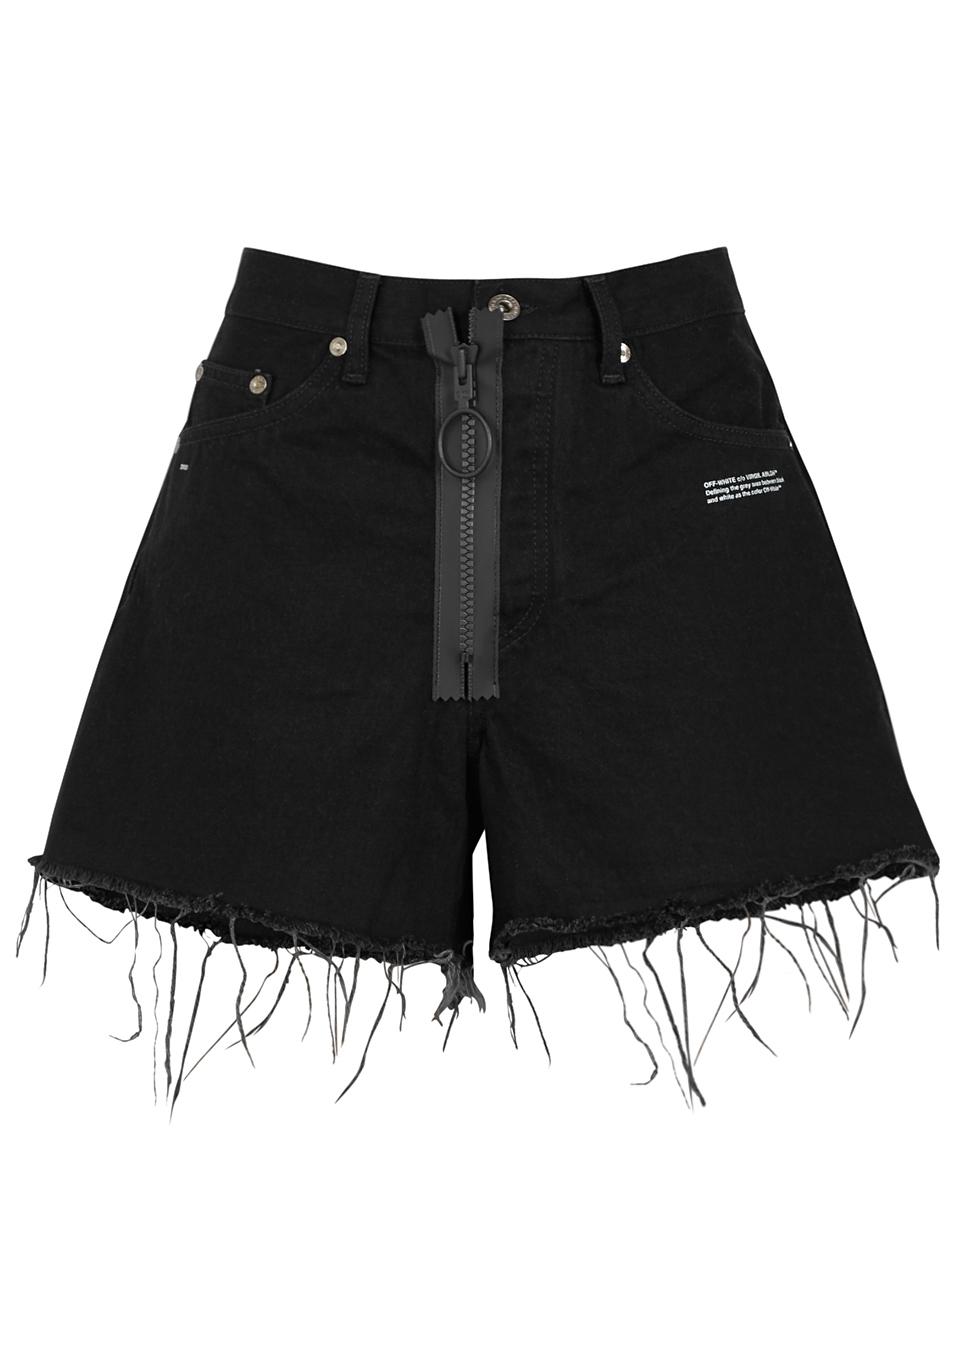 Black Appliquéd Denim Shorts